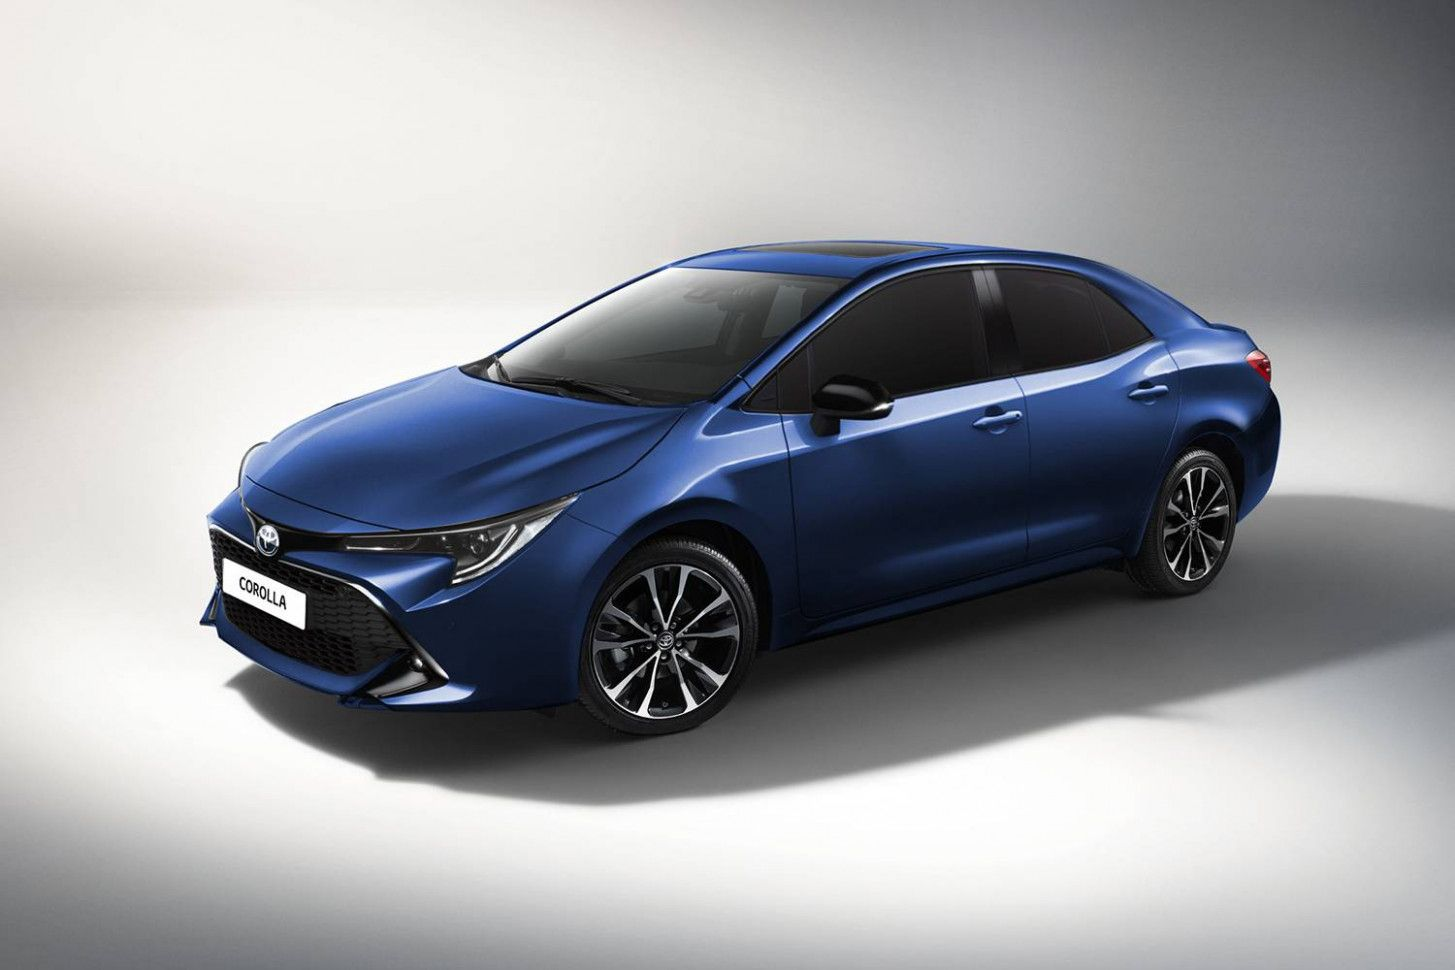 2021 Toyota Avensis Price Design And Di 2020